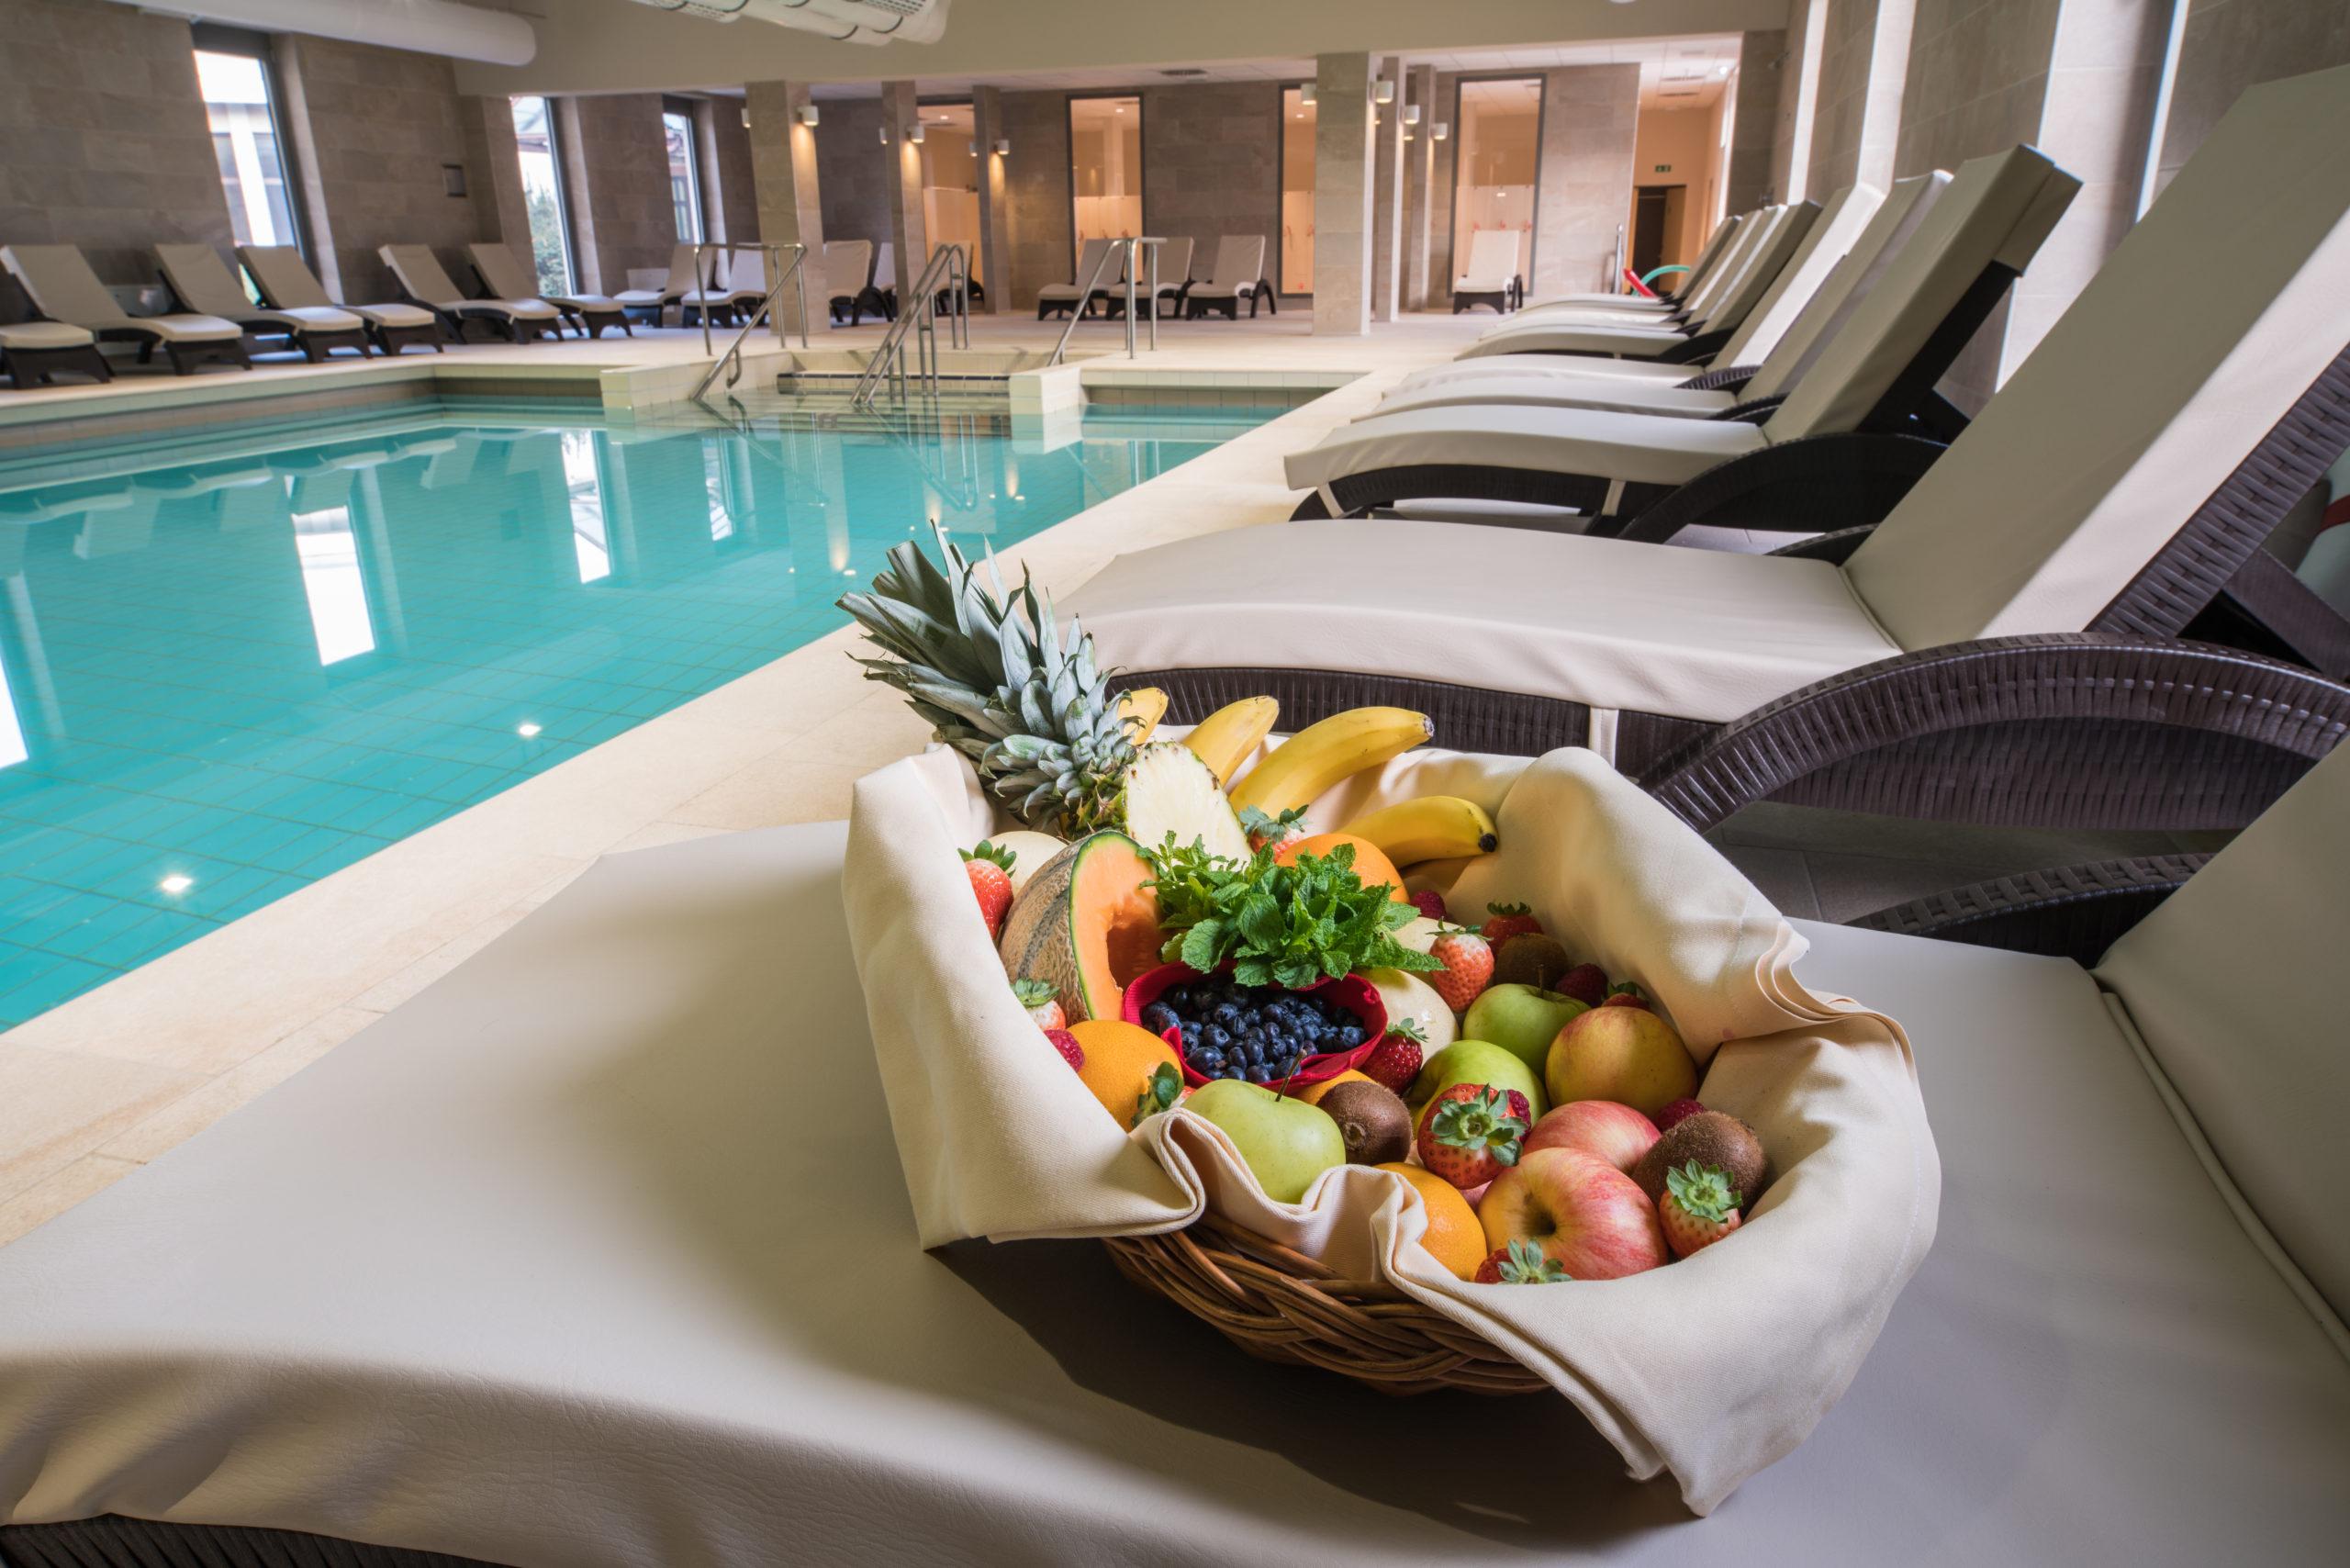 Indoor pool_23_Hotel Termal_T3000_Foto SS_11 15